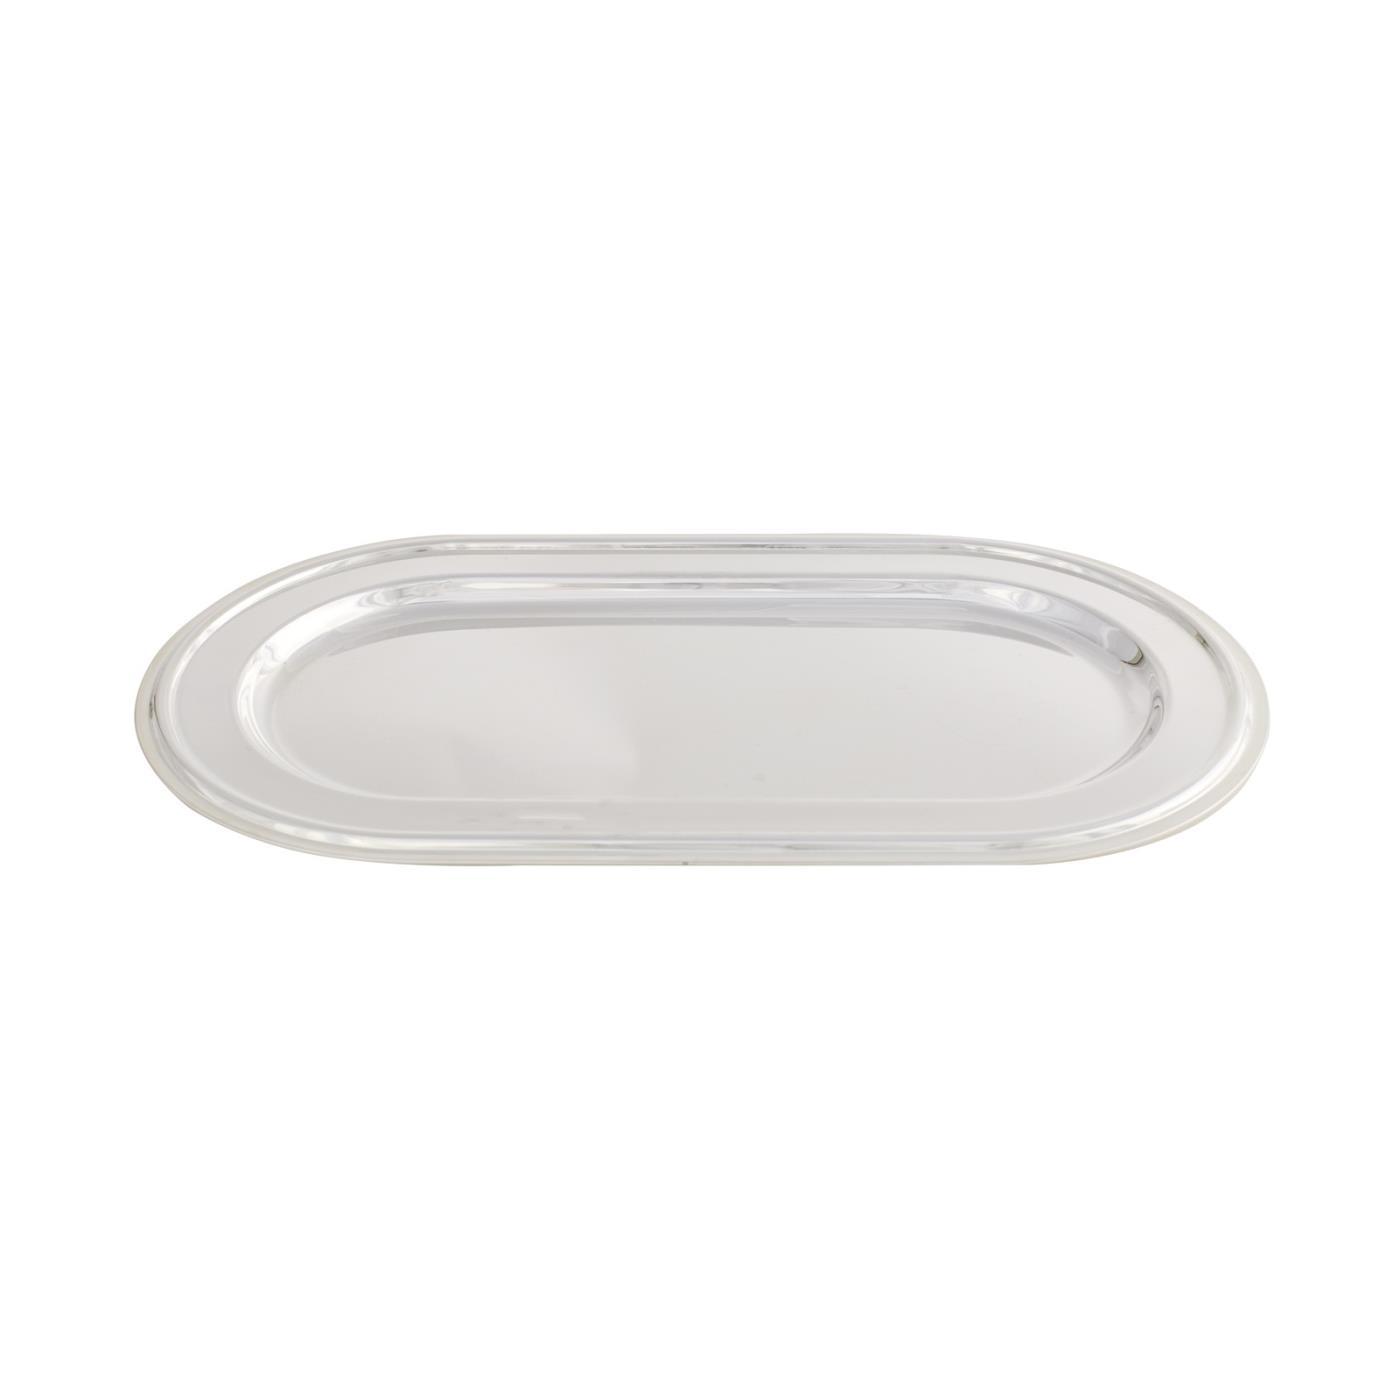 Sugar & Creamer Tray - Silver Contemporary